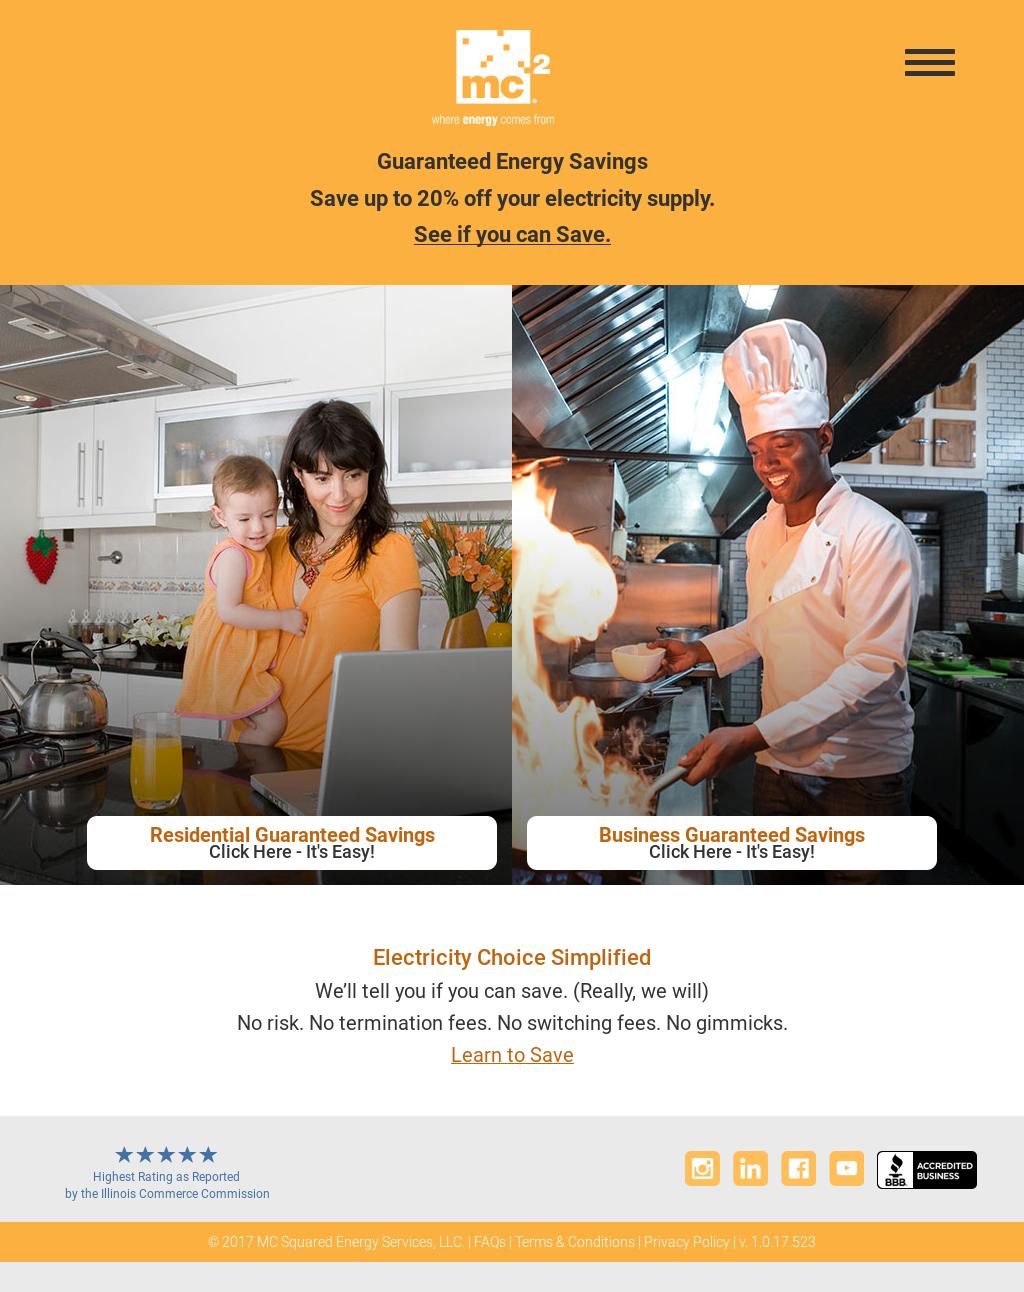 MC Squared Energy Services Competitors, Revenue and